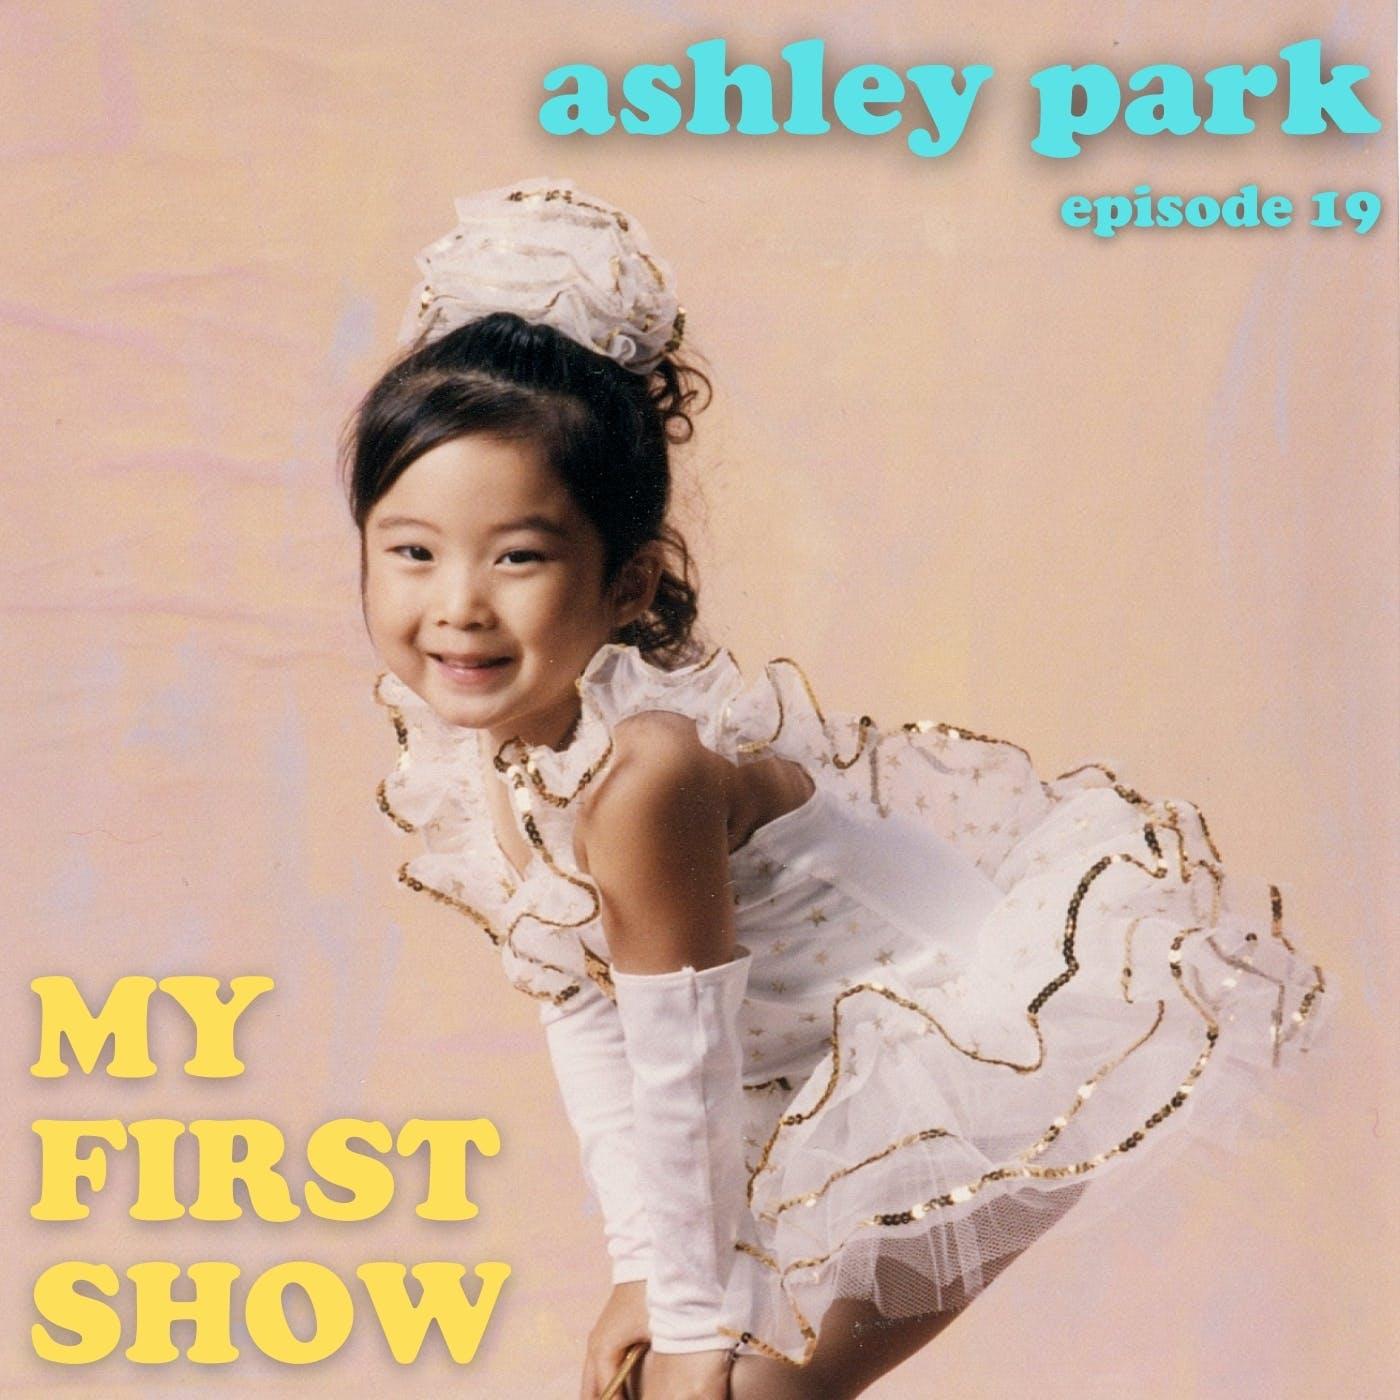 S1/Ep19: Ashley Park